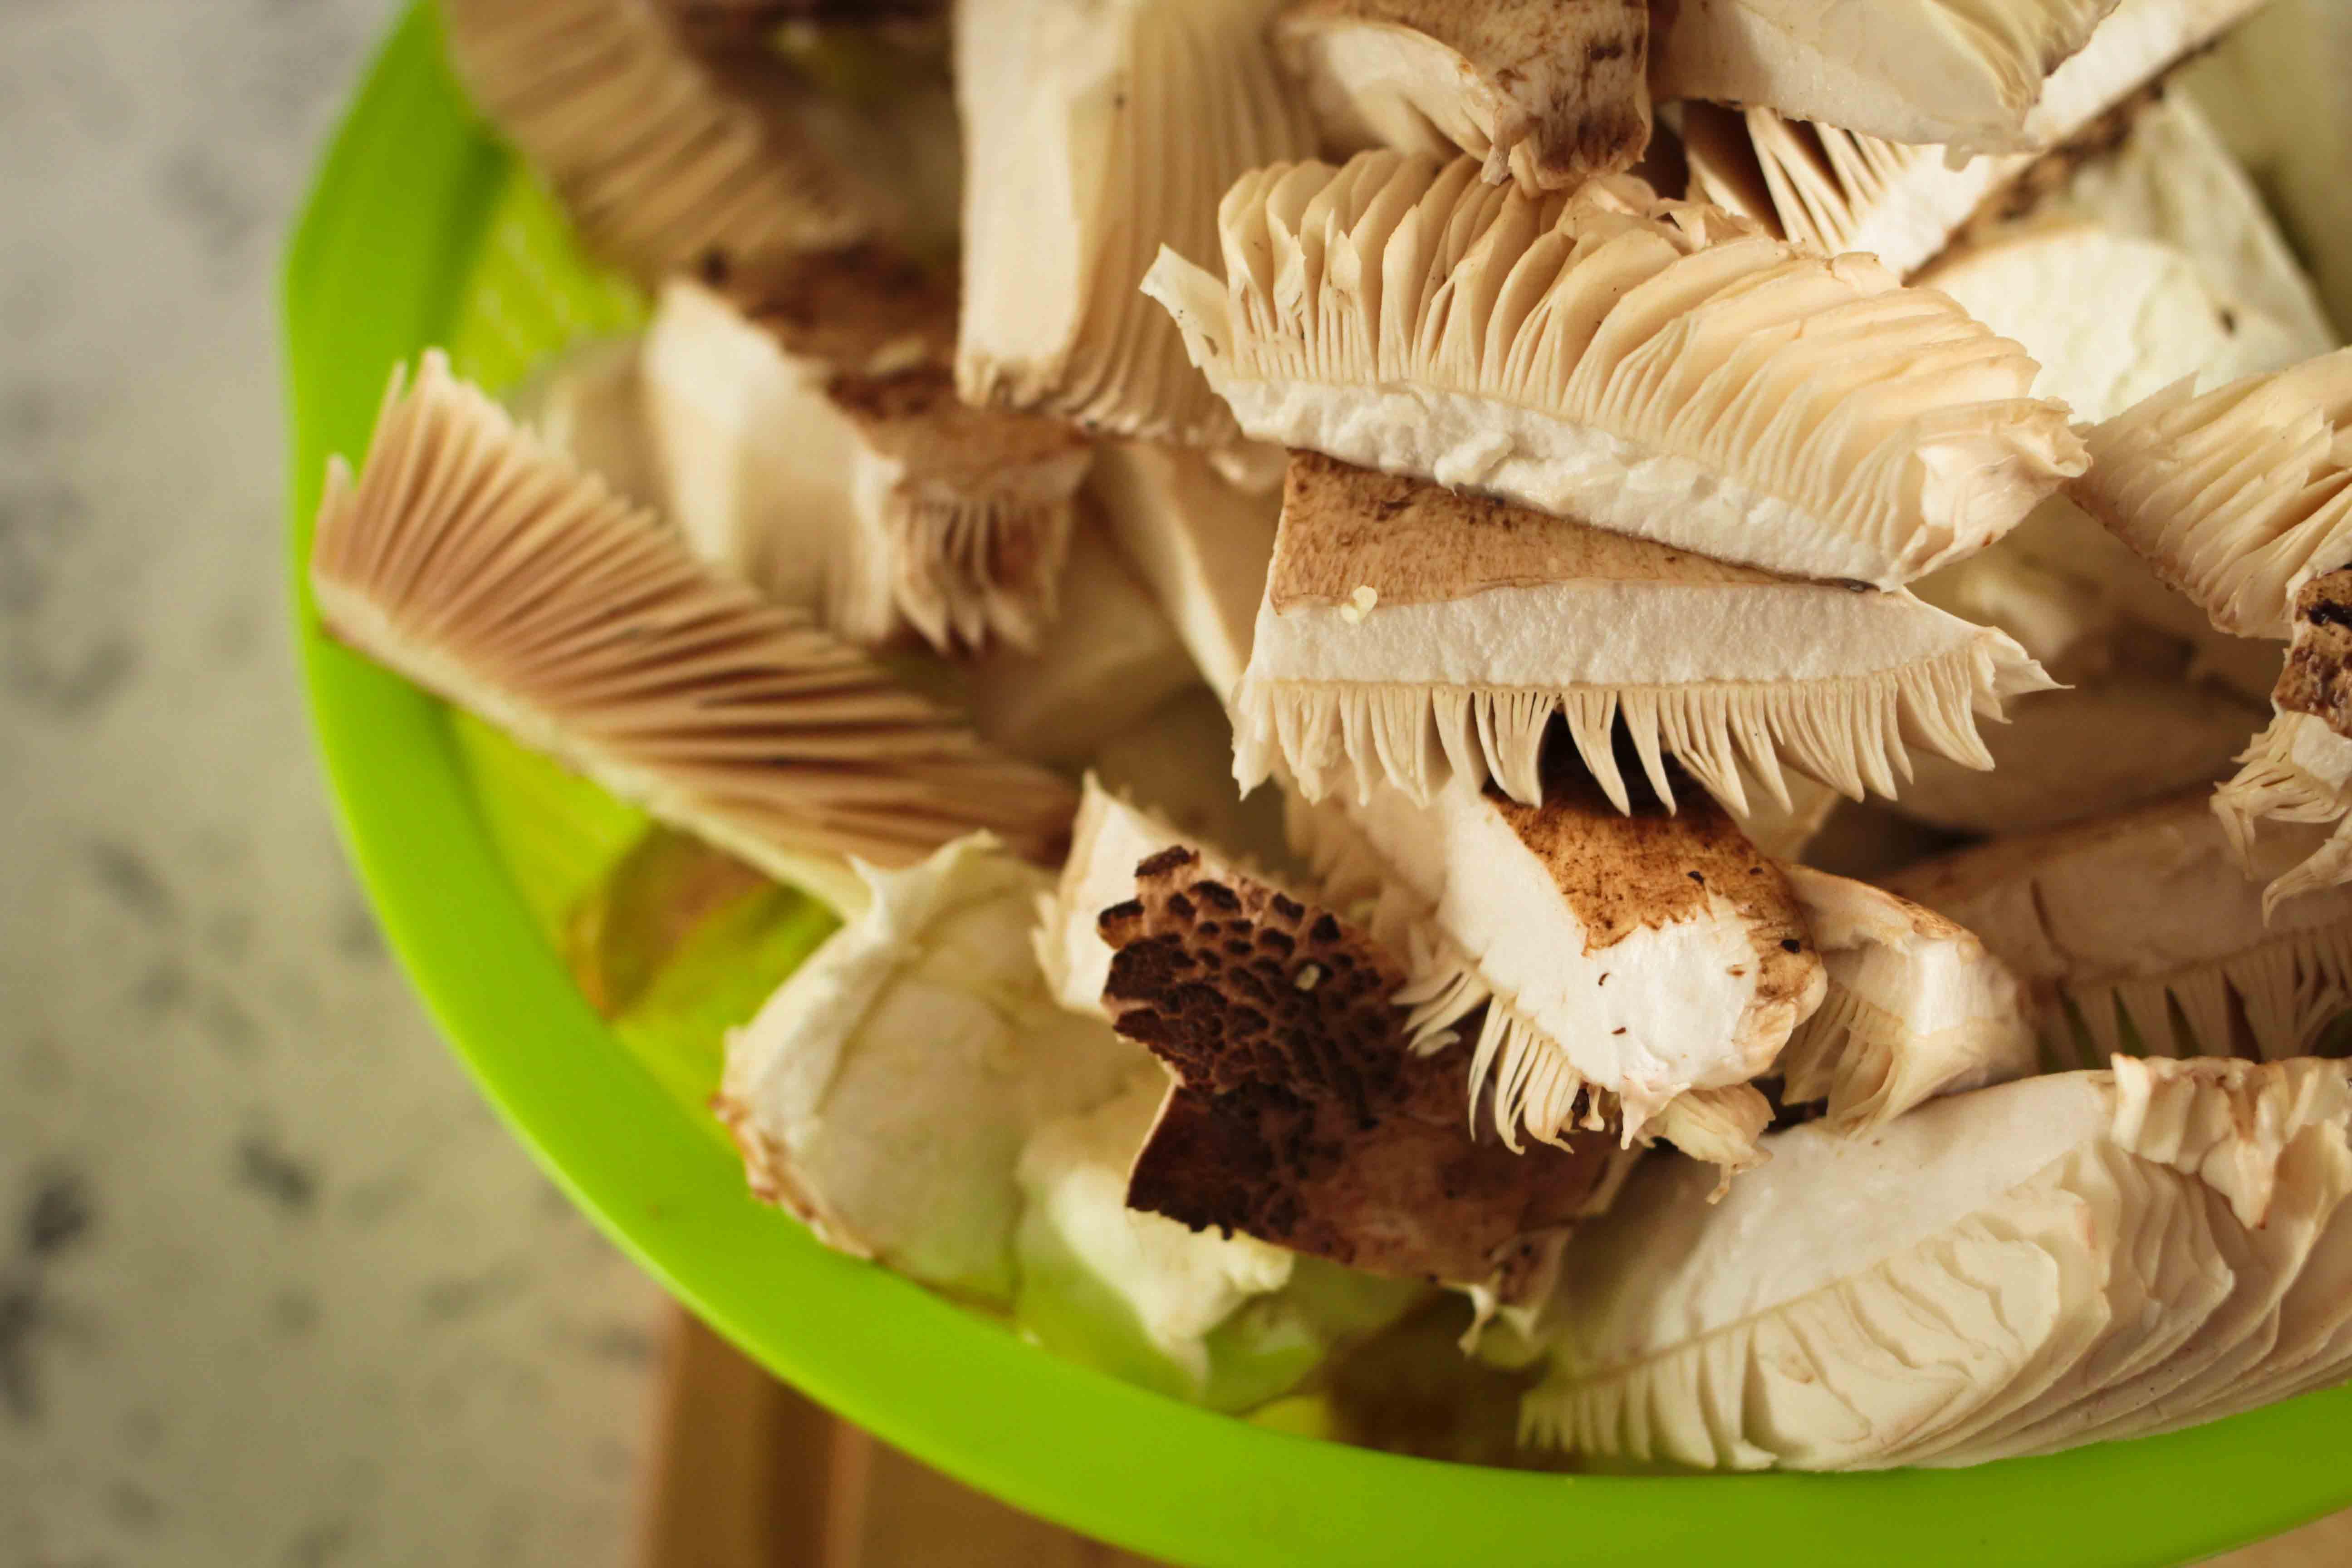 claudialeclercq-edible mushrooms-champignons comestibles_-13